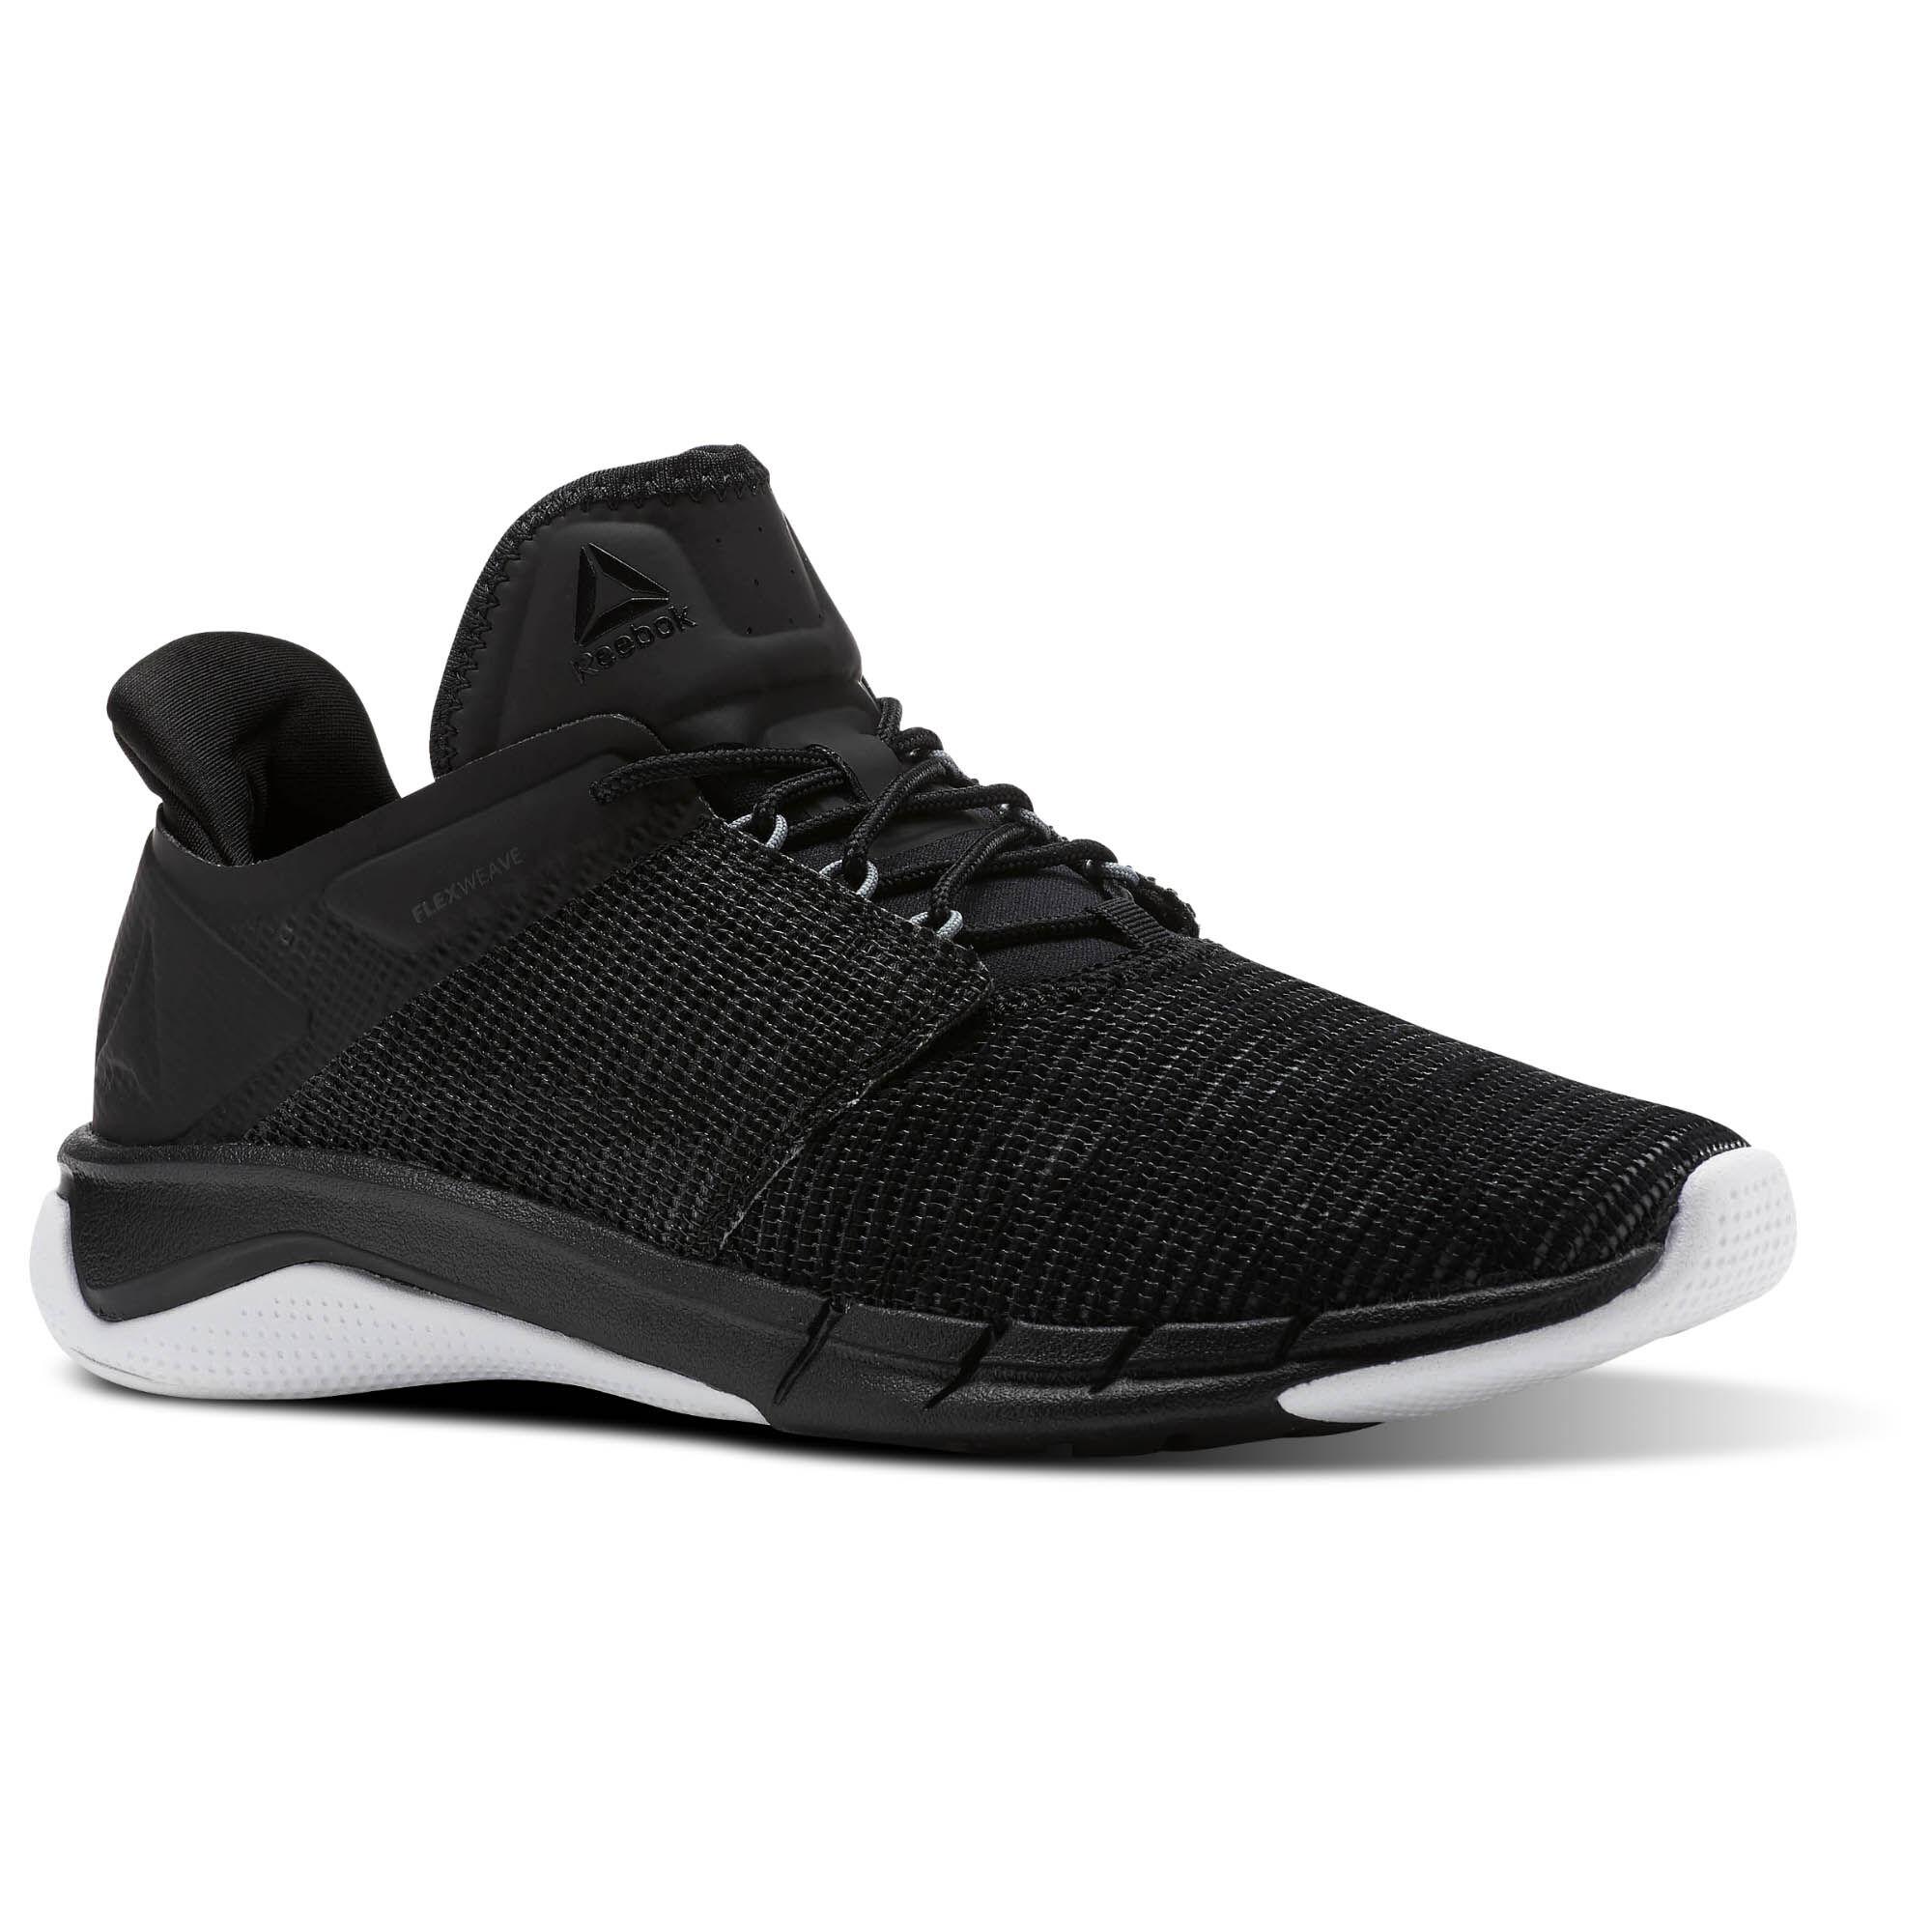 Reebok - Fast Flexweave Black/Coal/Flint Grey/White CN1401